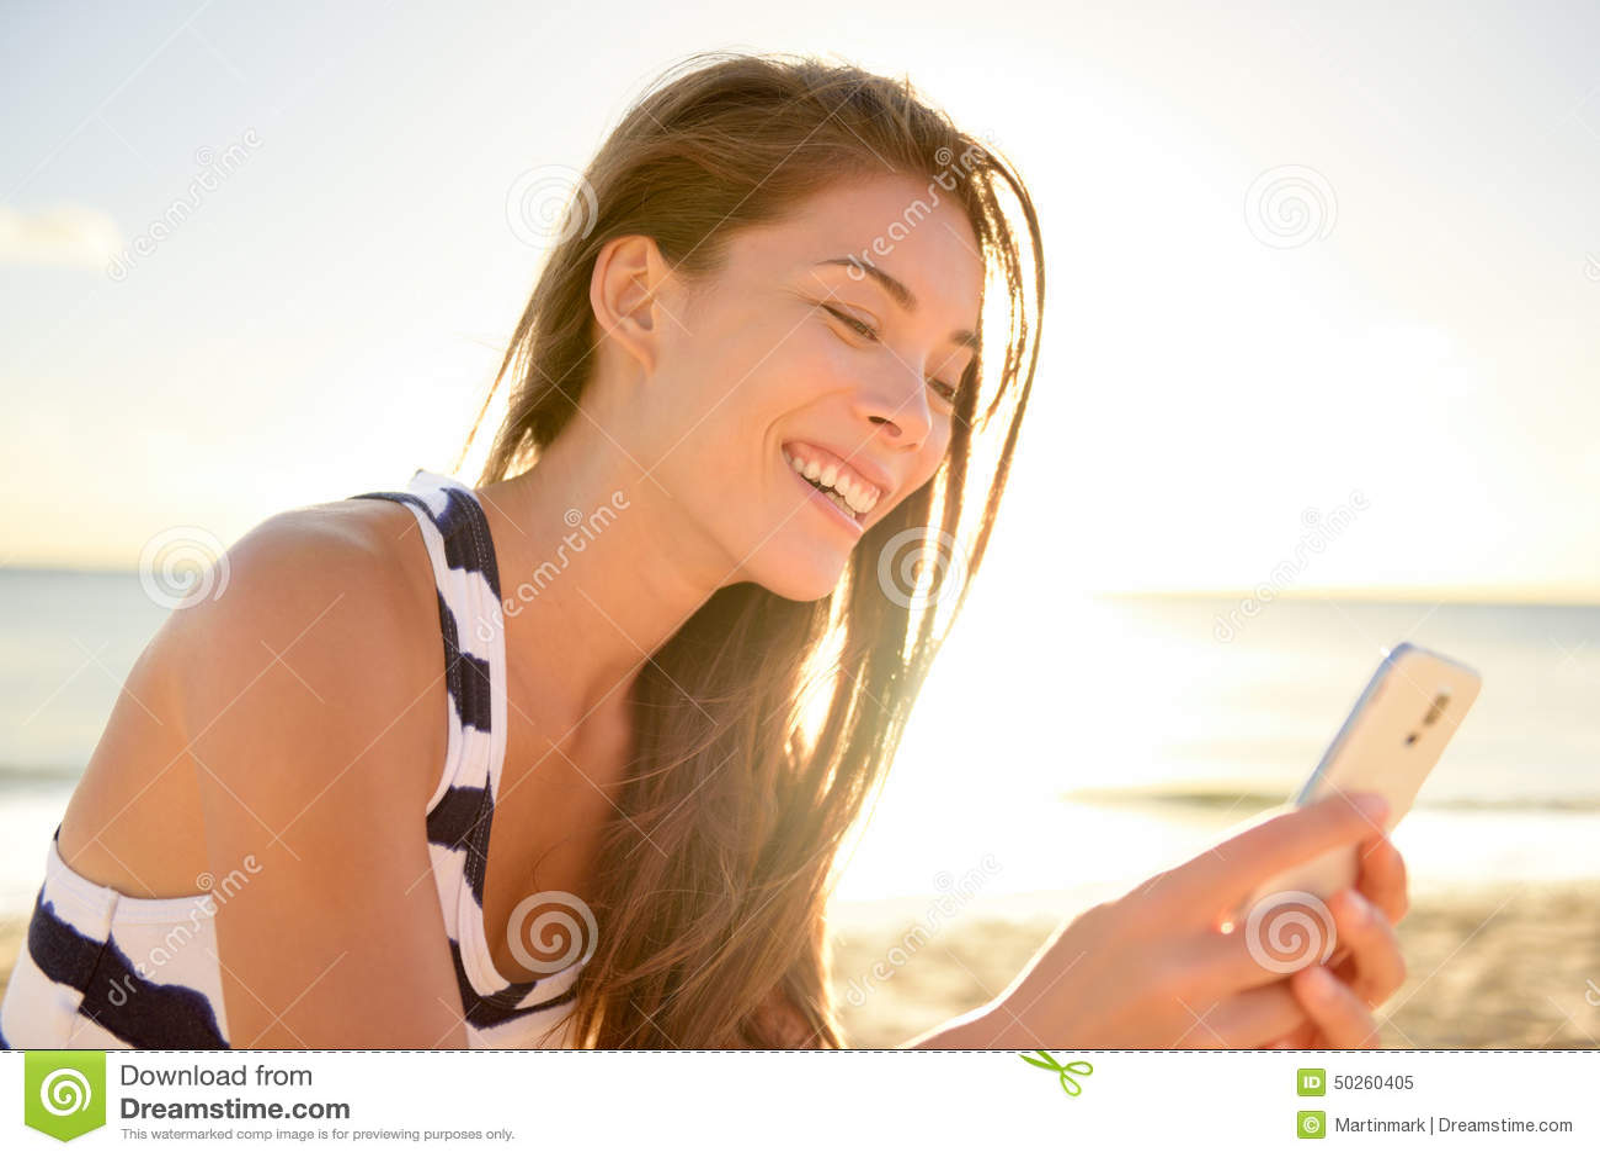 Jovem mulher bonita na praia com telefone esperto